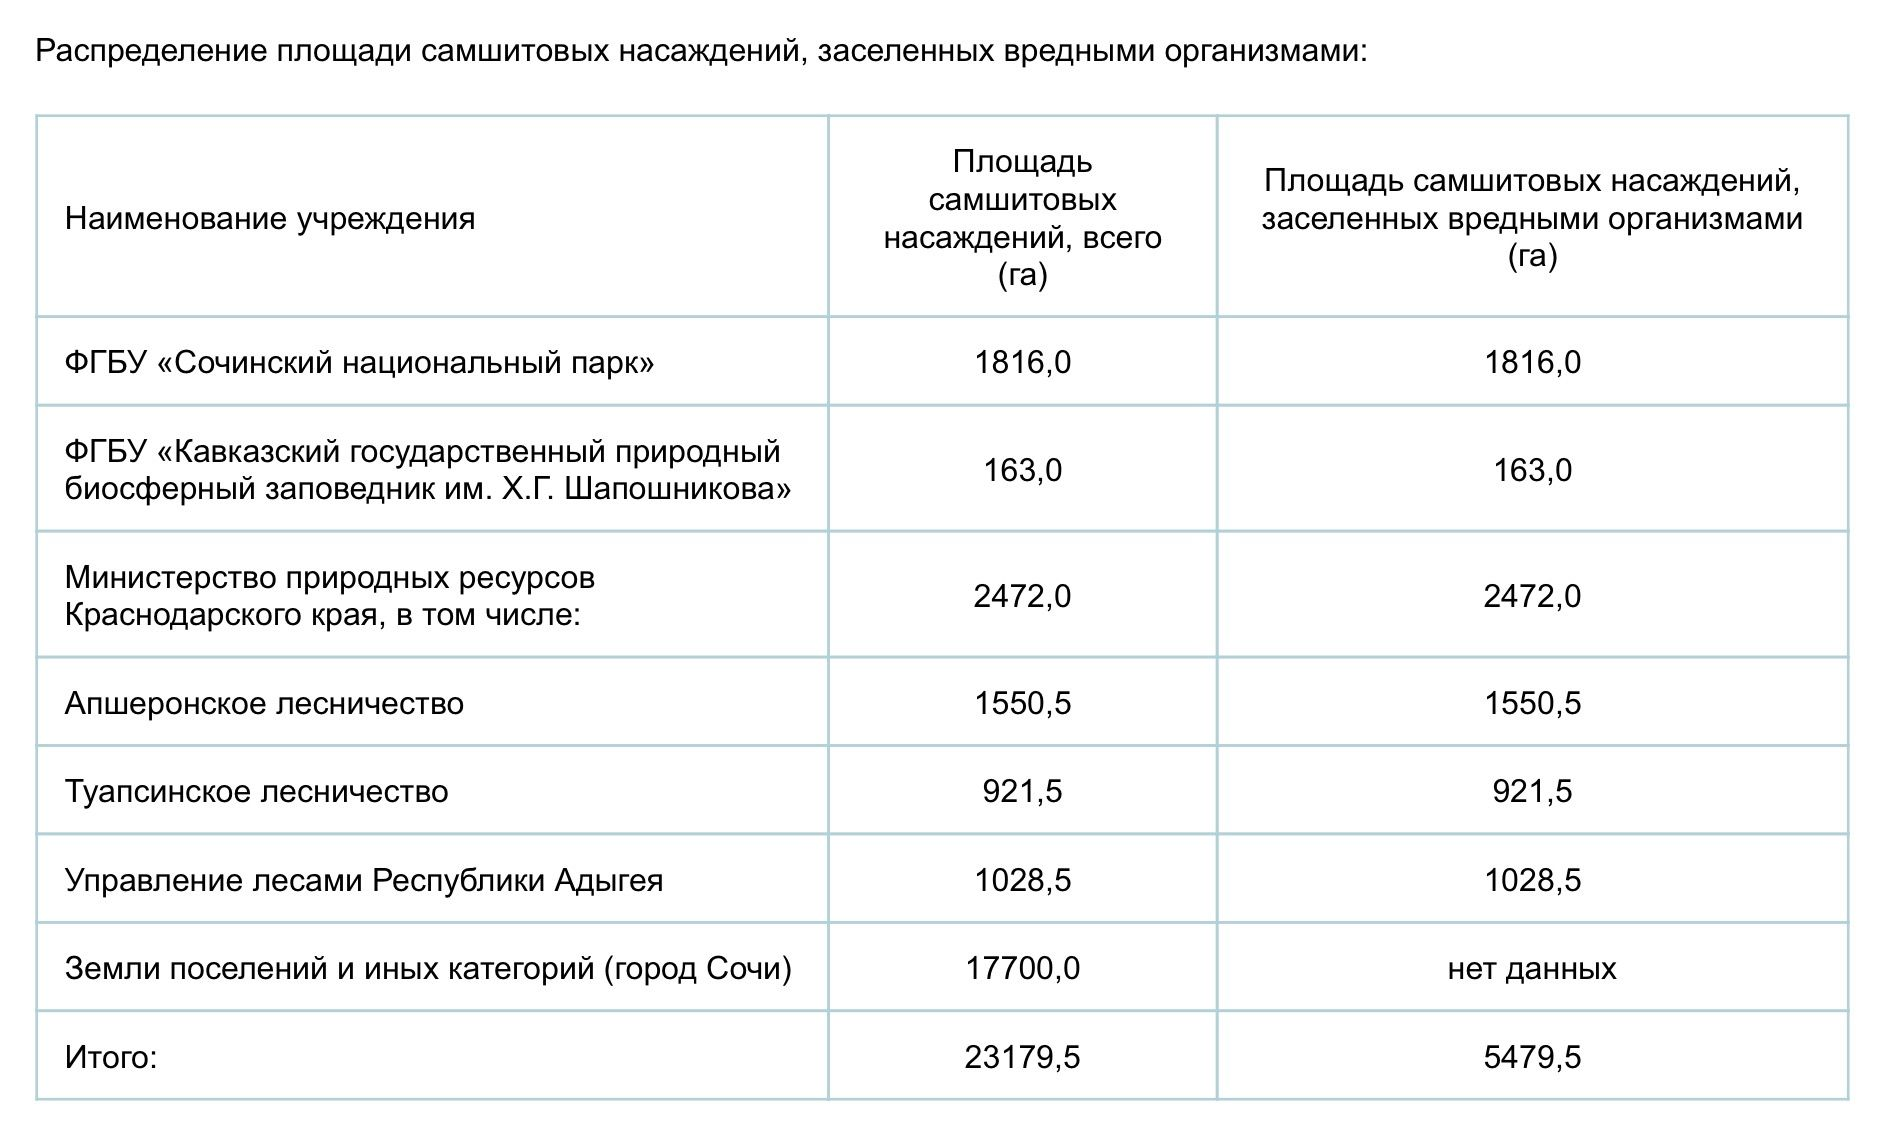 ©Таблица с сайта министерства природы Краснодарского края, mprkk.ru